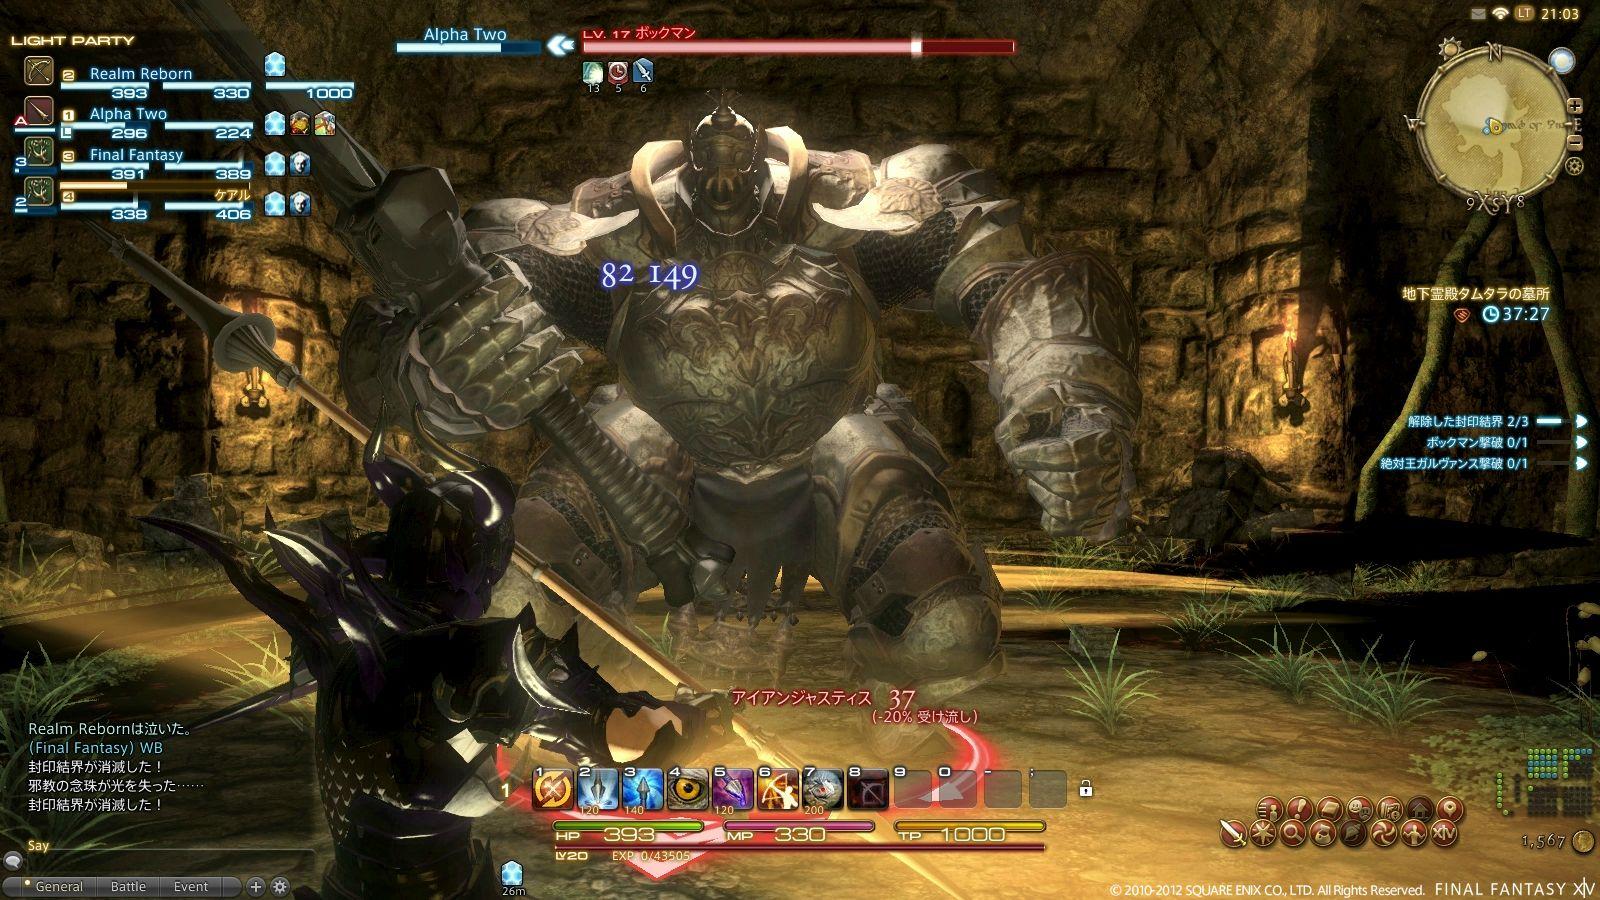 Final Fantasy XIV A Realm Reborn -2